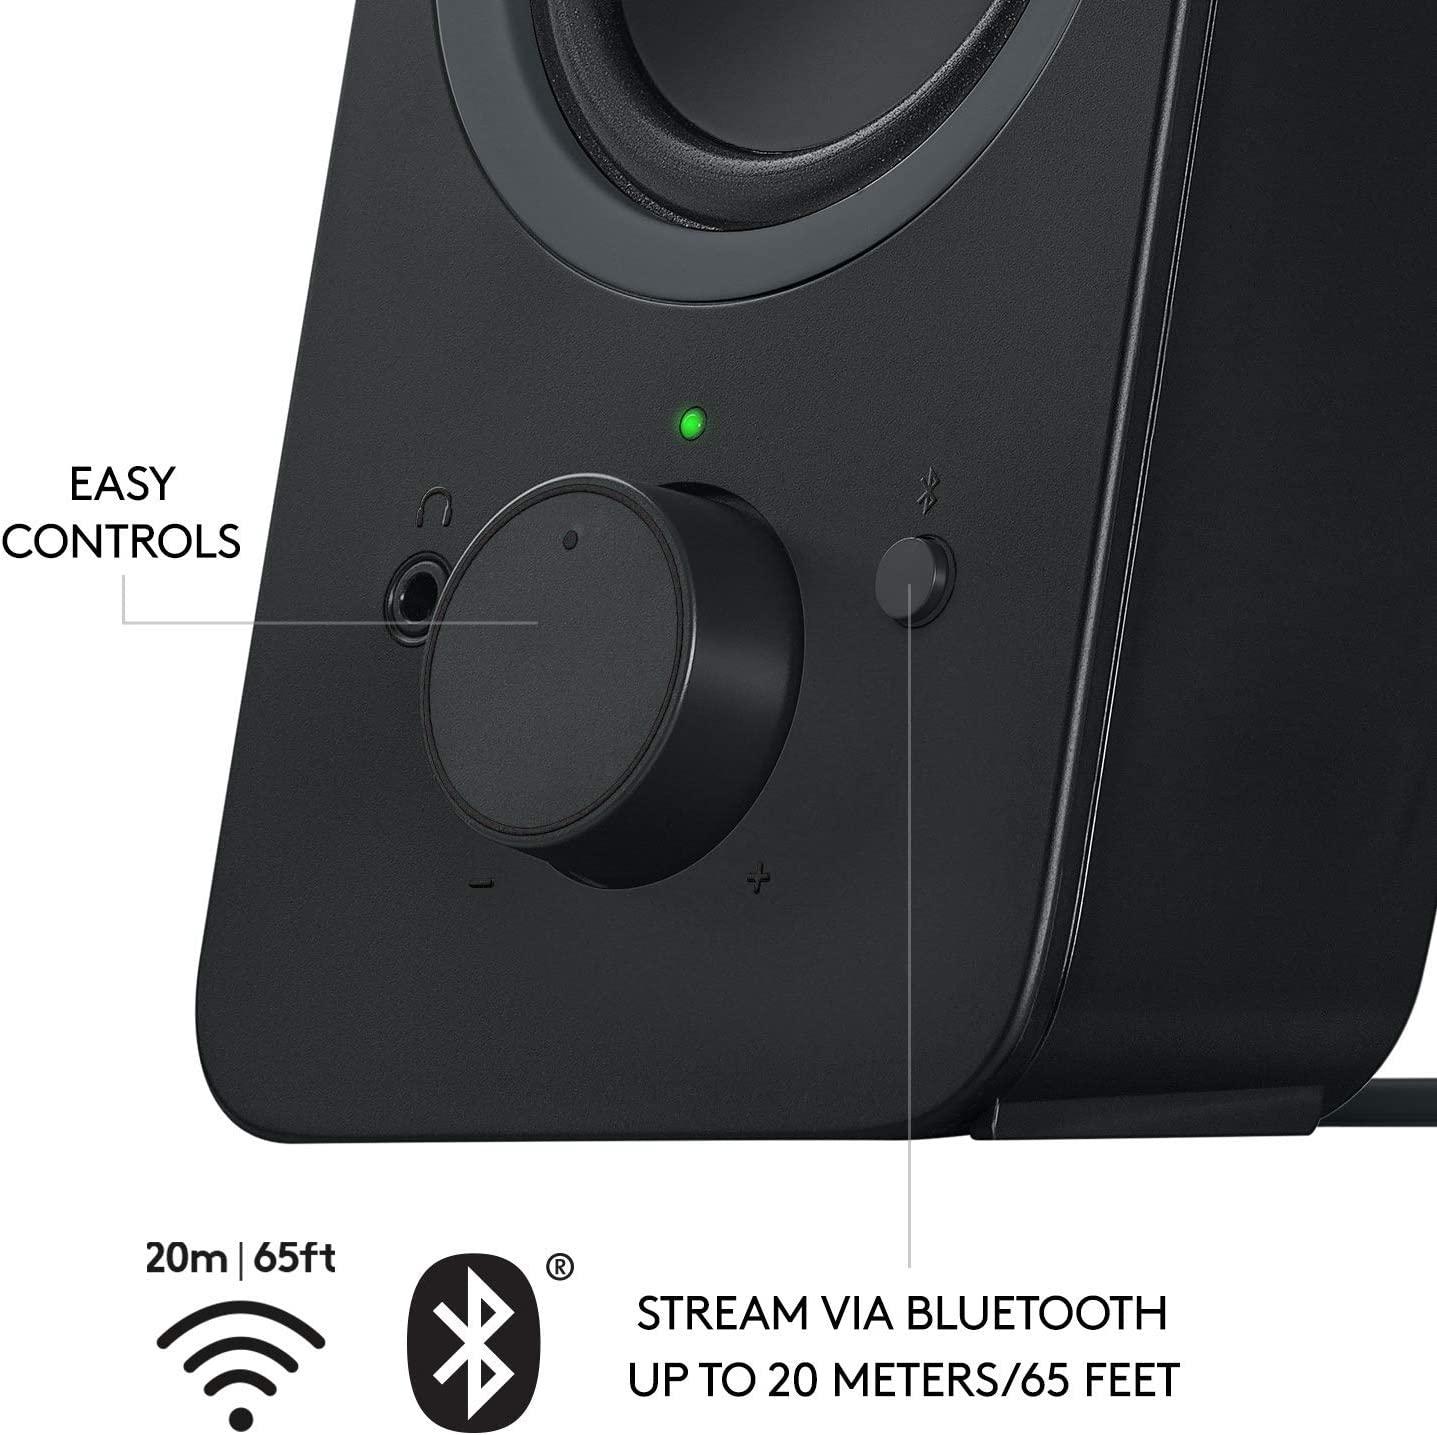 980-001294 Black Logitech Logitech Z207 2.0 Multi Device Stereo Speaker